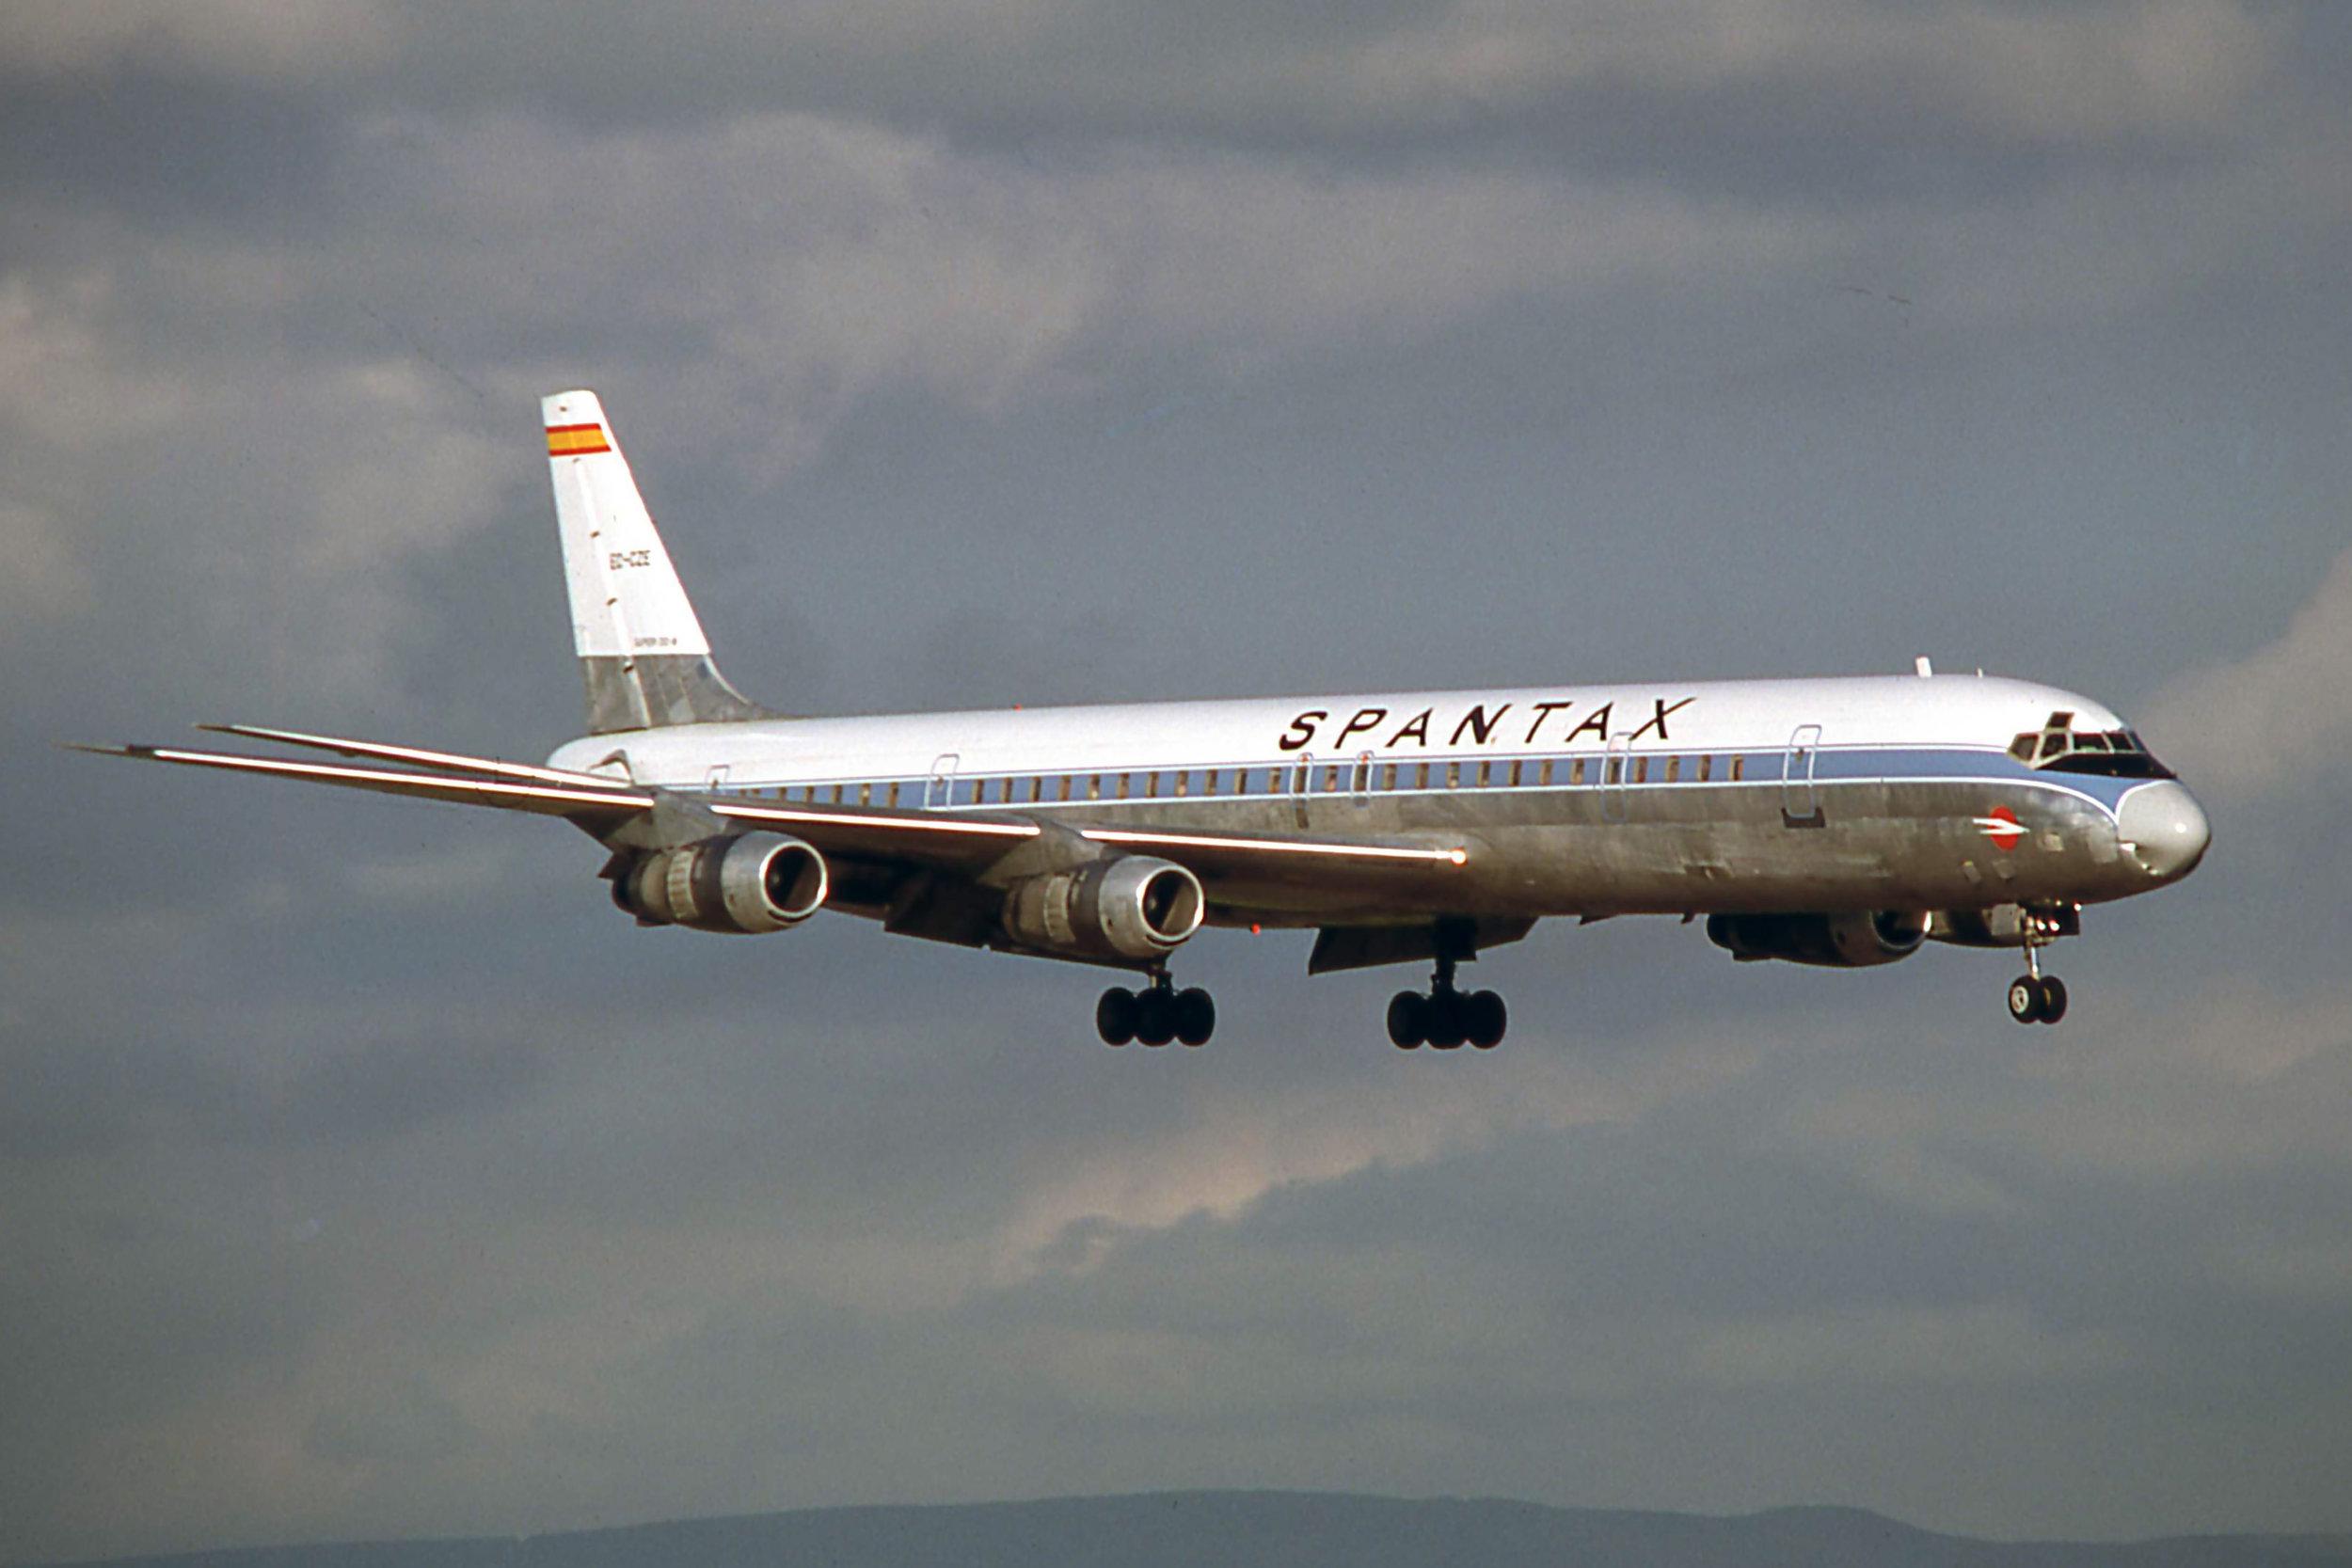 DC-8 EC-CZE (August 1978) (3) a.jpg